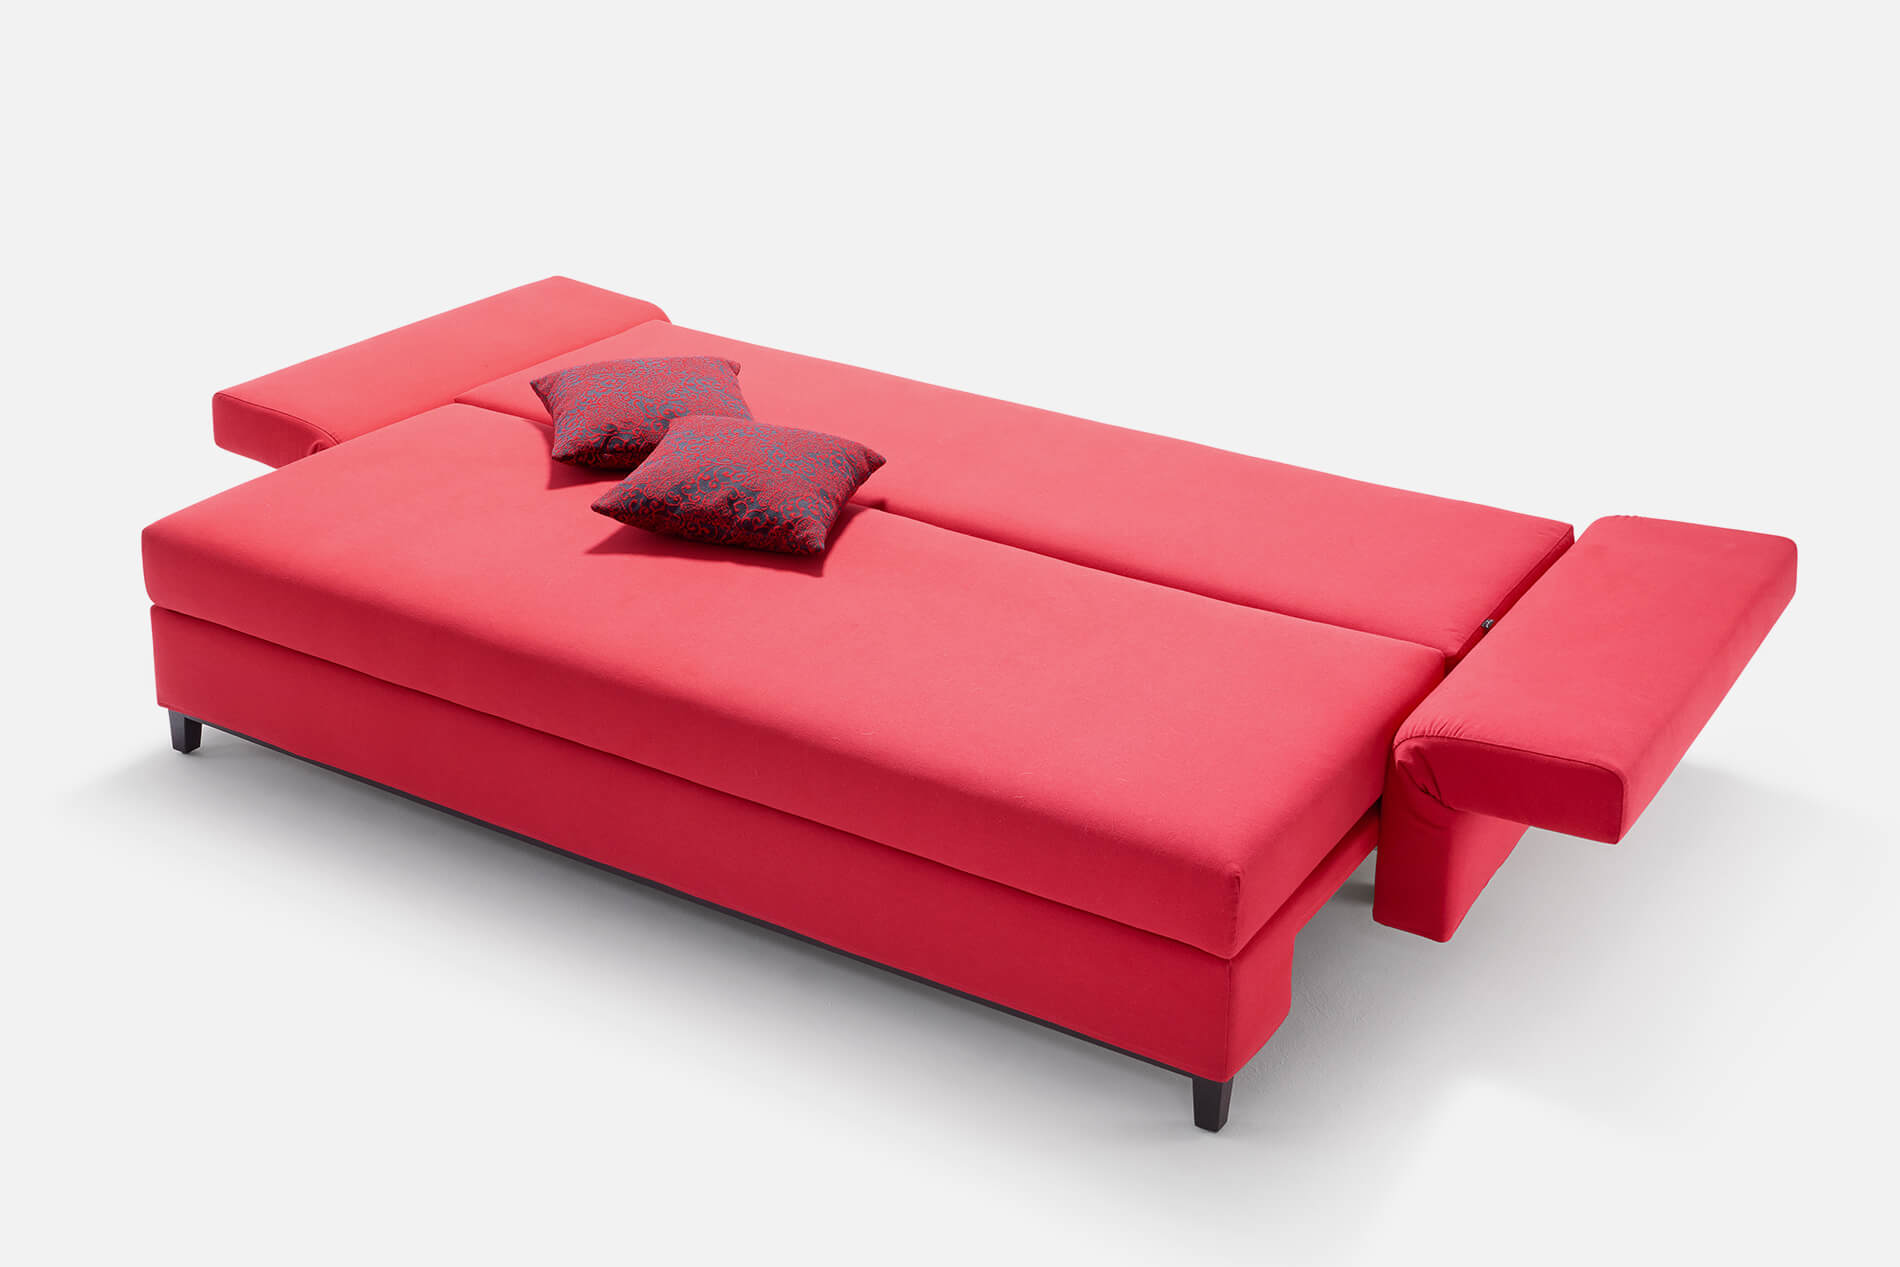 Full Size of Goodlife Sofa Malaysia Furniture Amazon Good Life Signet Love Schlafsofa Von Individueller Querschlfer Xxl Grau 2 5 Sitzer Big Braun Ektorp Landhausstil Sofa Goodlife Sofa